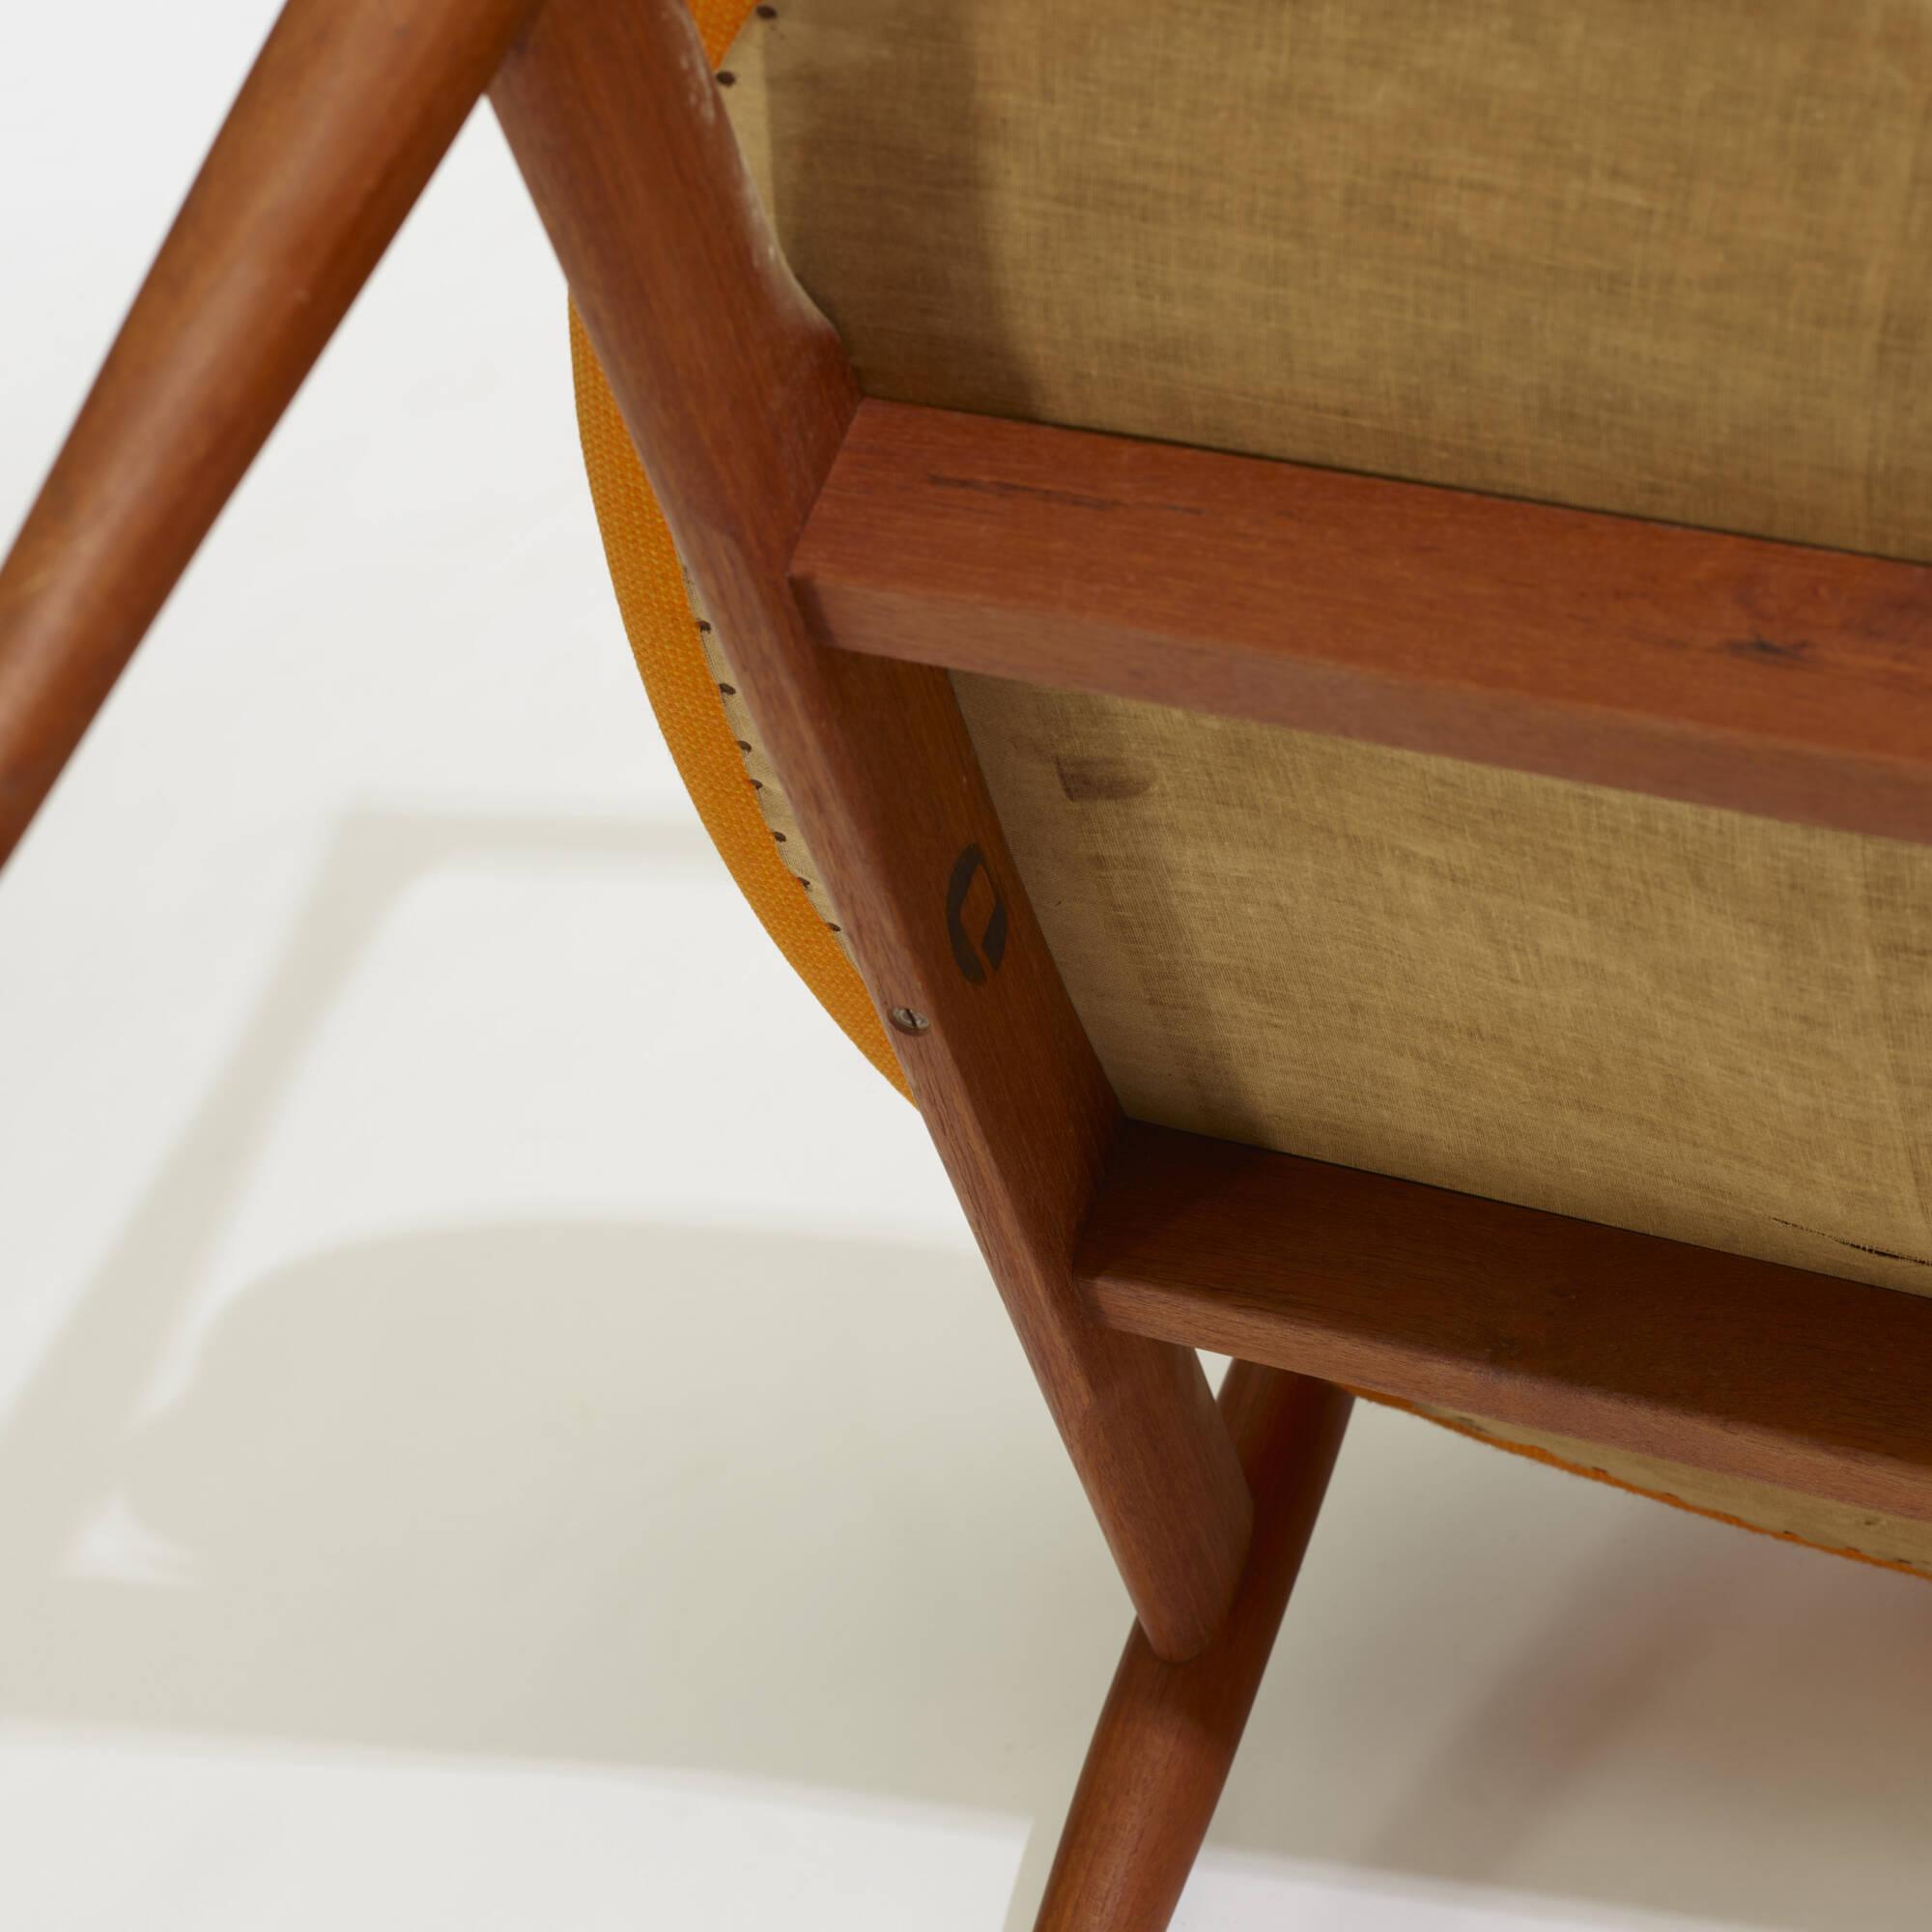 318: Ib Kofod-Larsen / Elizabeth chairs, pair (4 of 4)